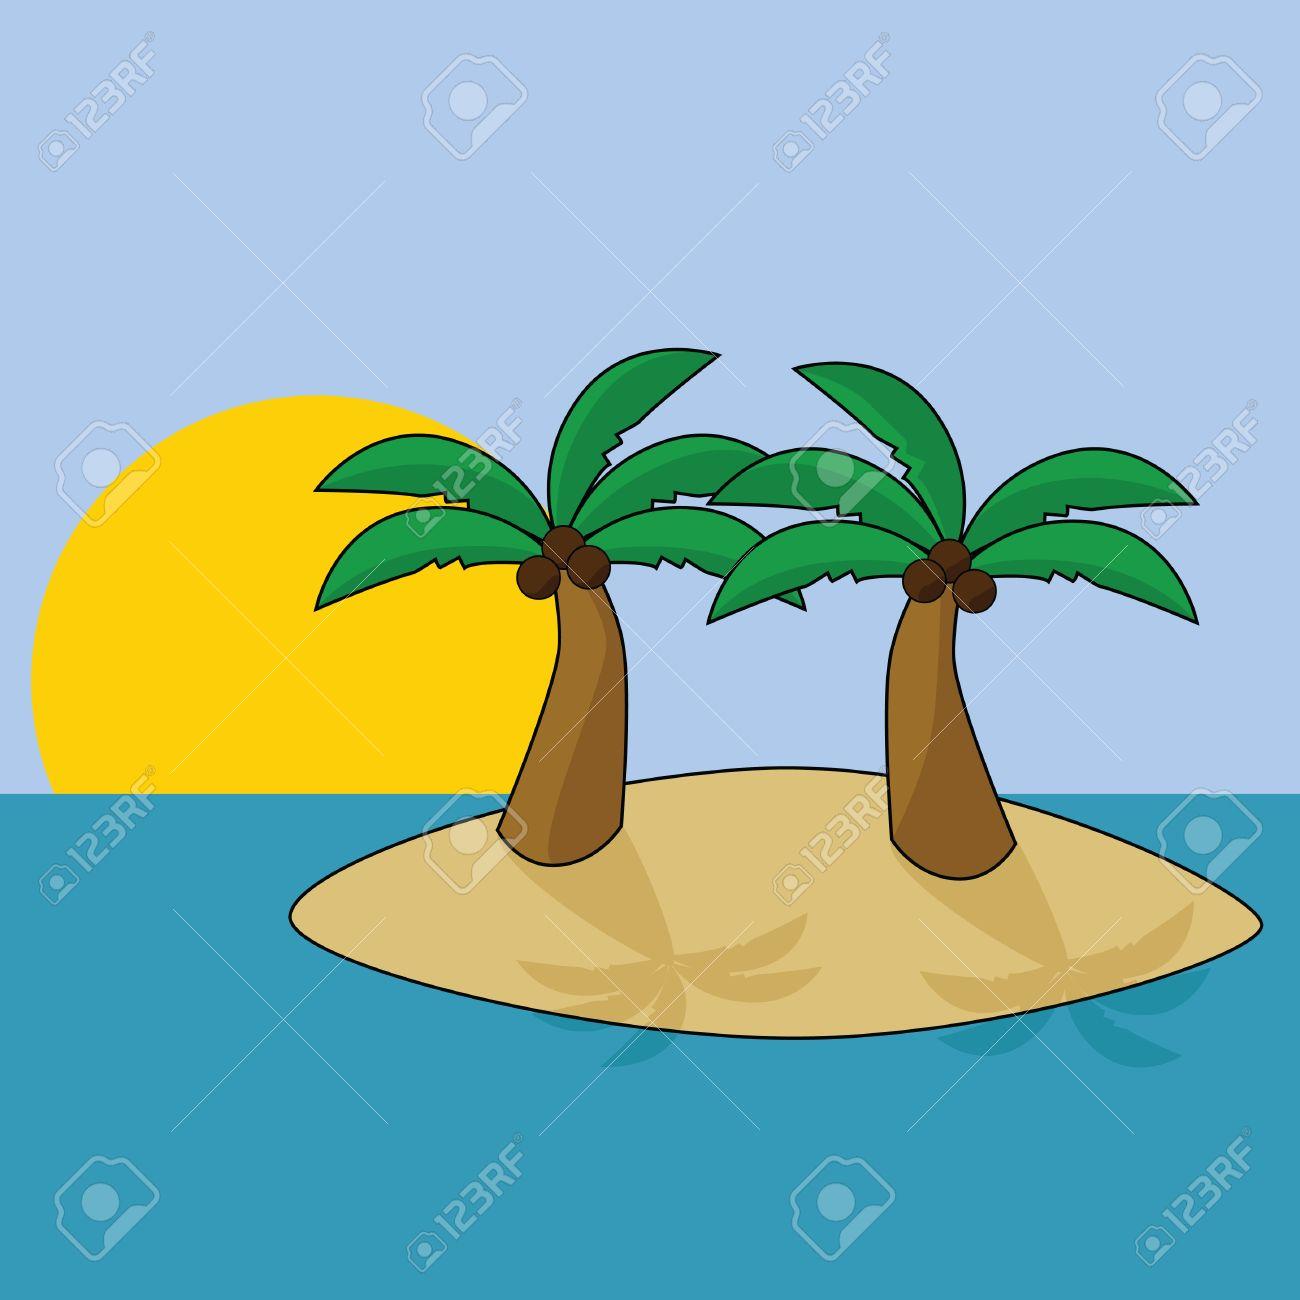 Cartoon Palm Tree Island Island With Two Palm Trees